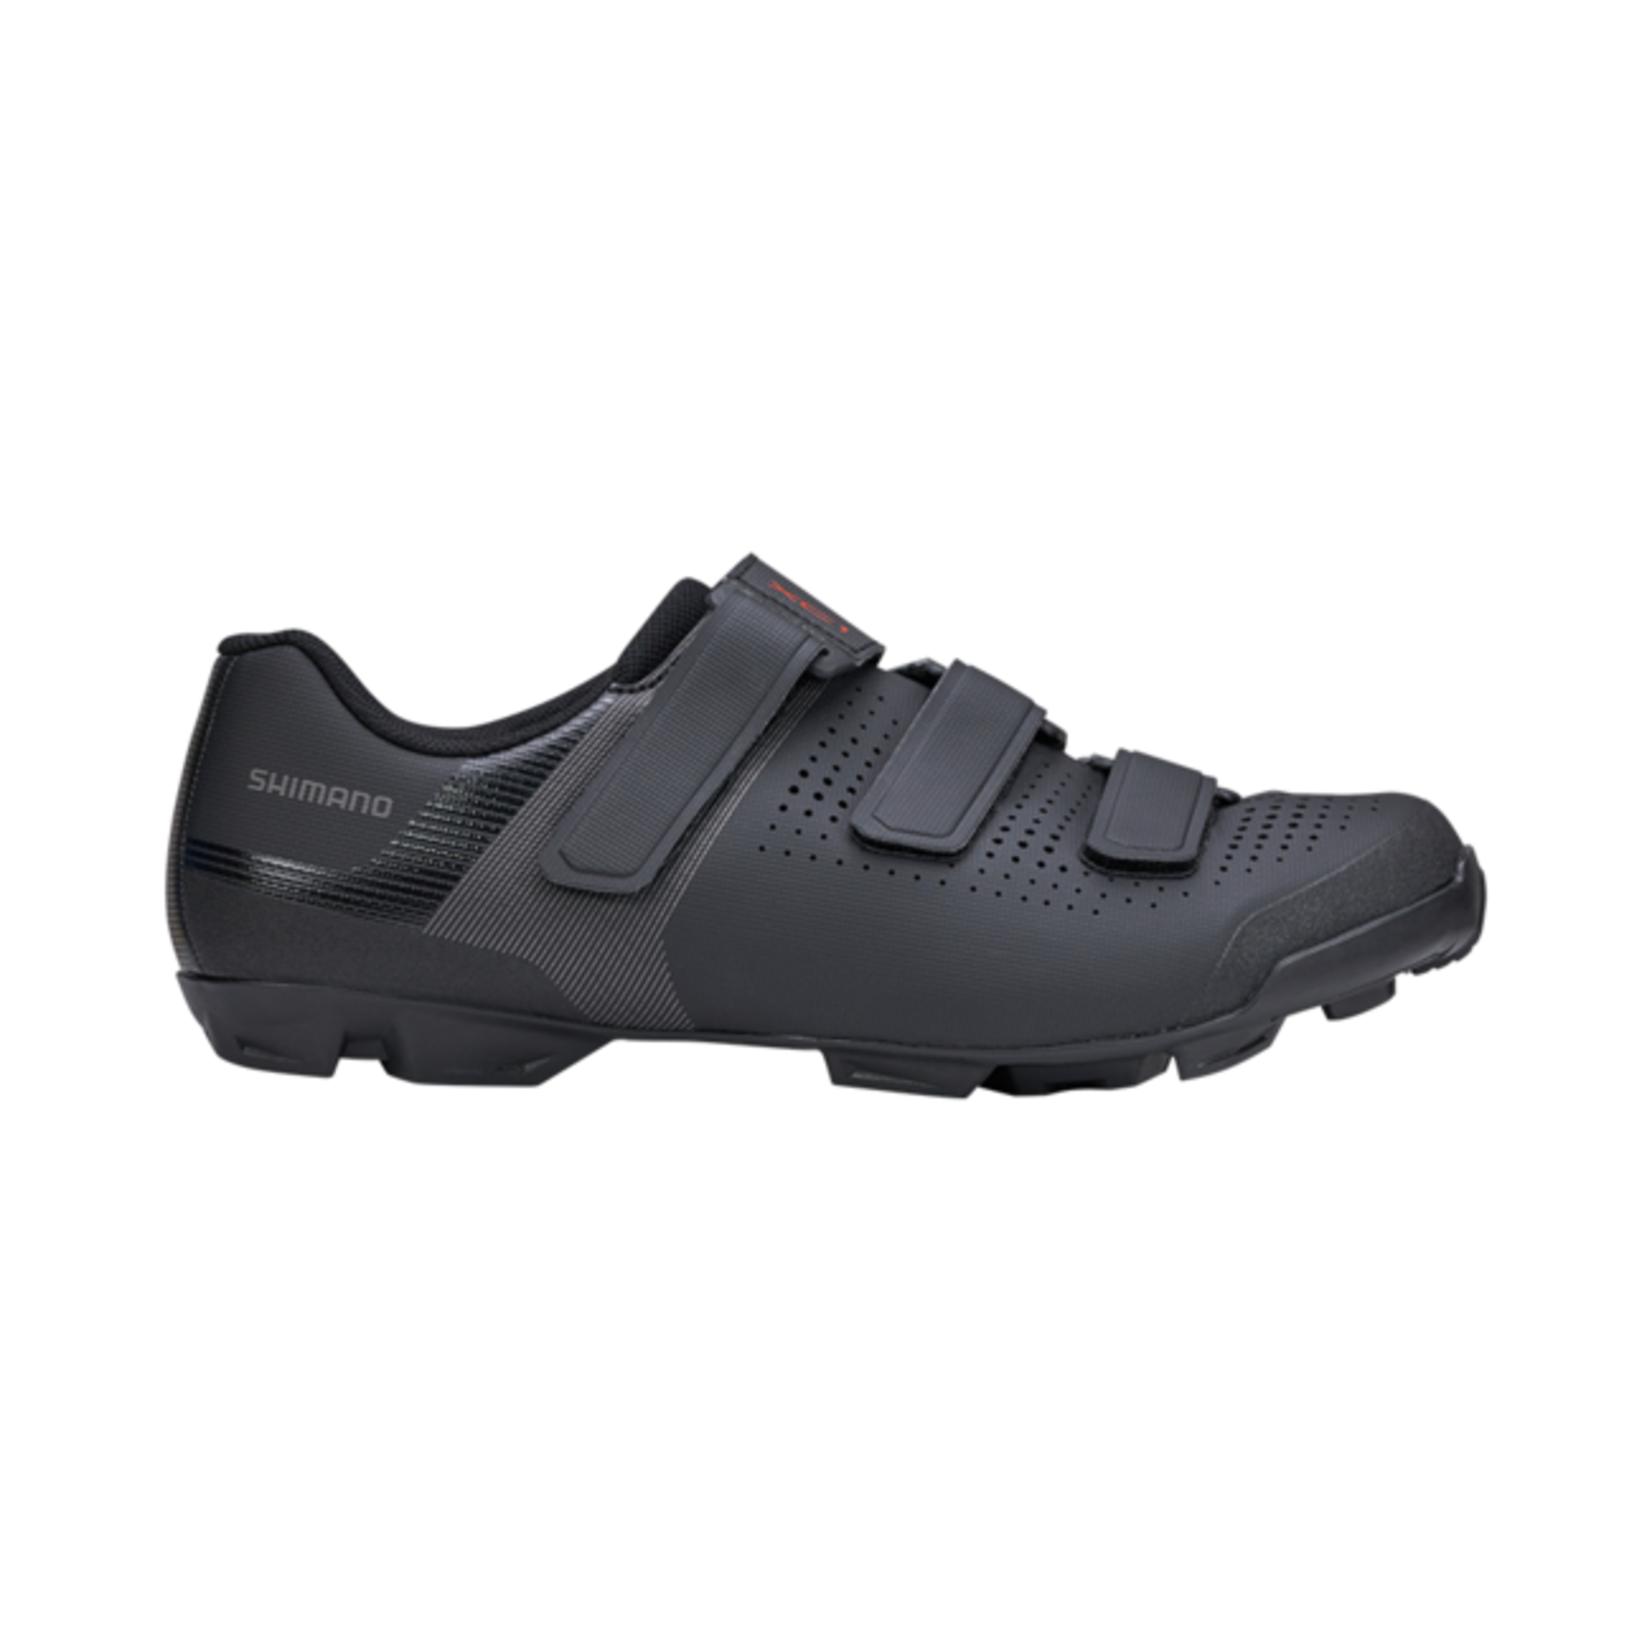 Shimano Shimano SH-XC100 Bicycle shoes Black